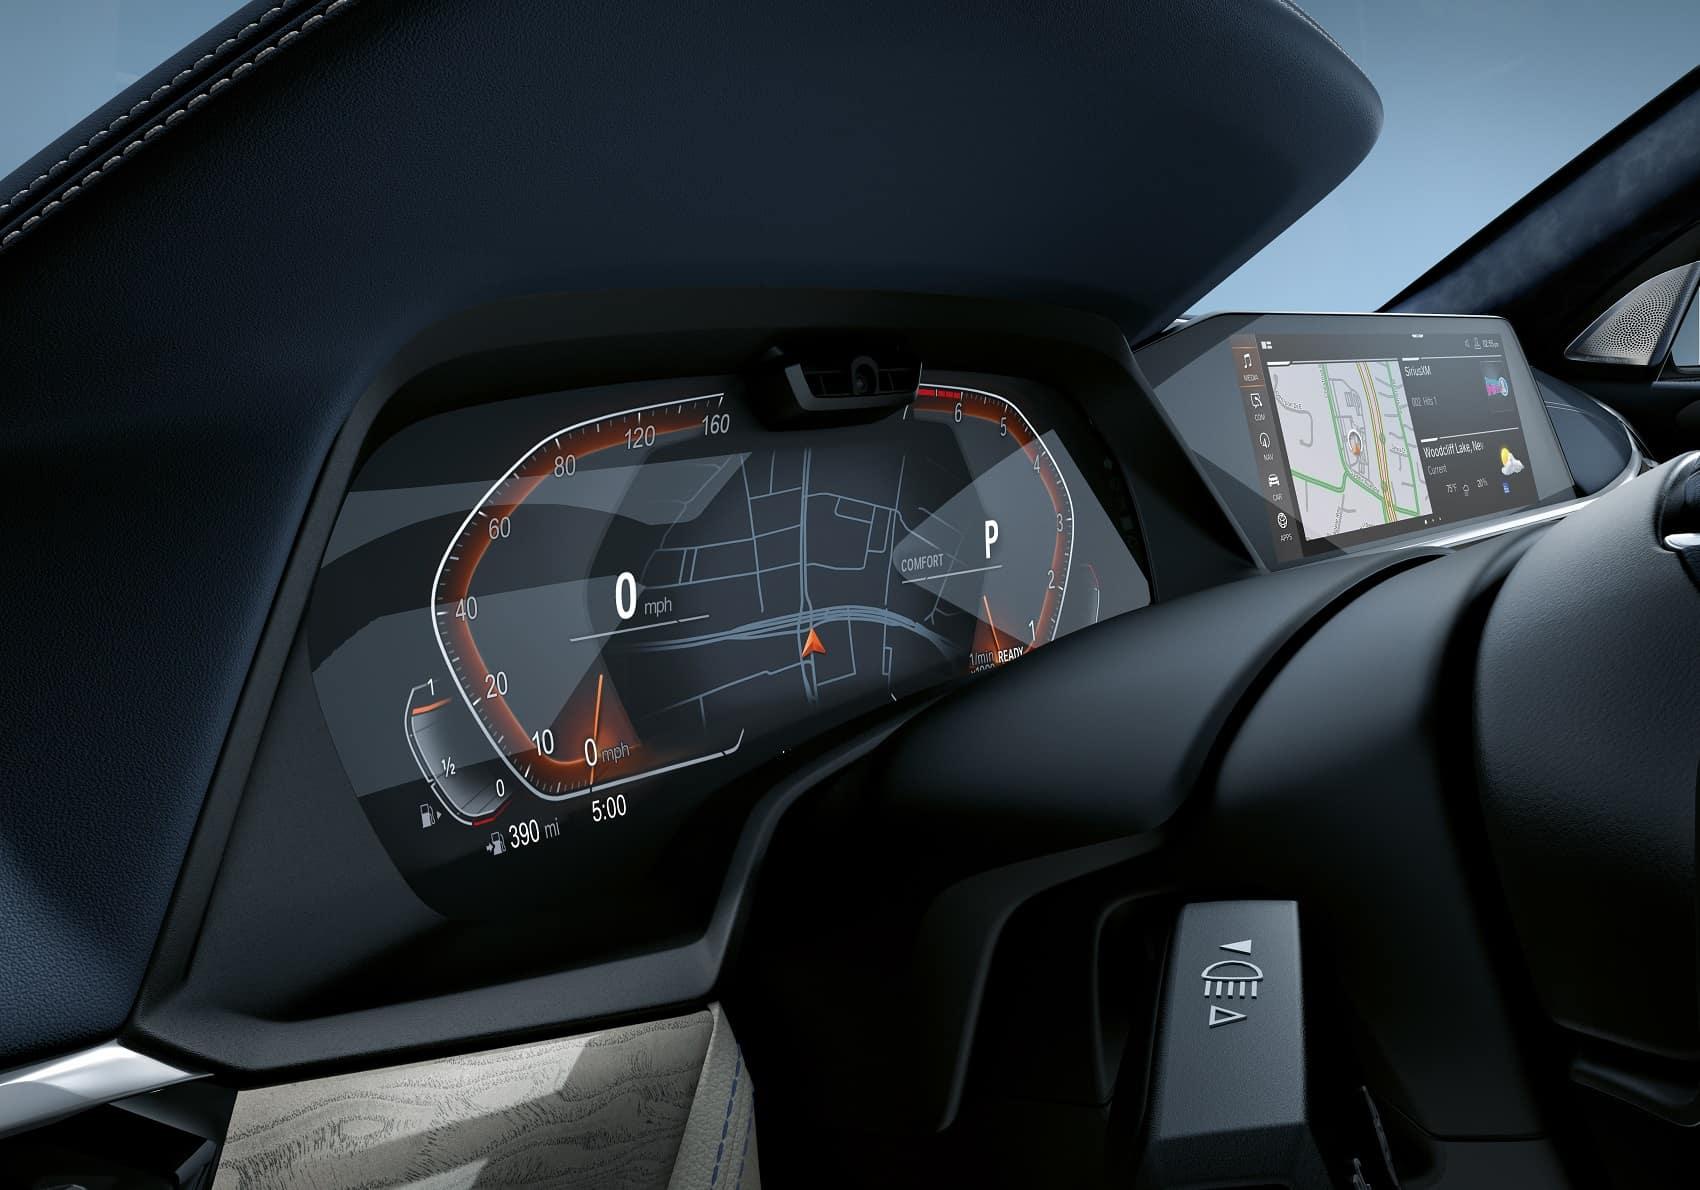 BMW X7 Interior Dashboard Technology